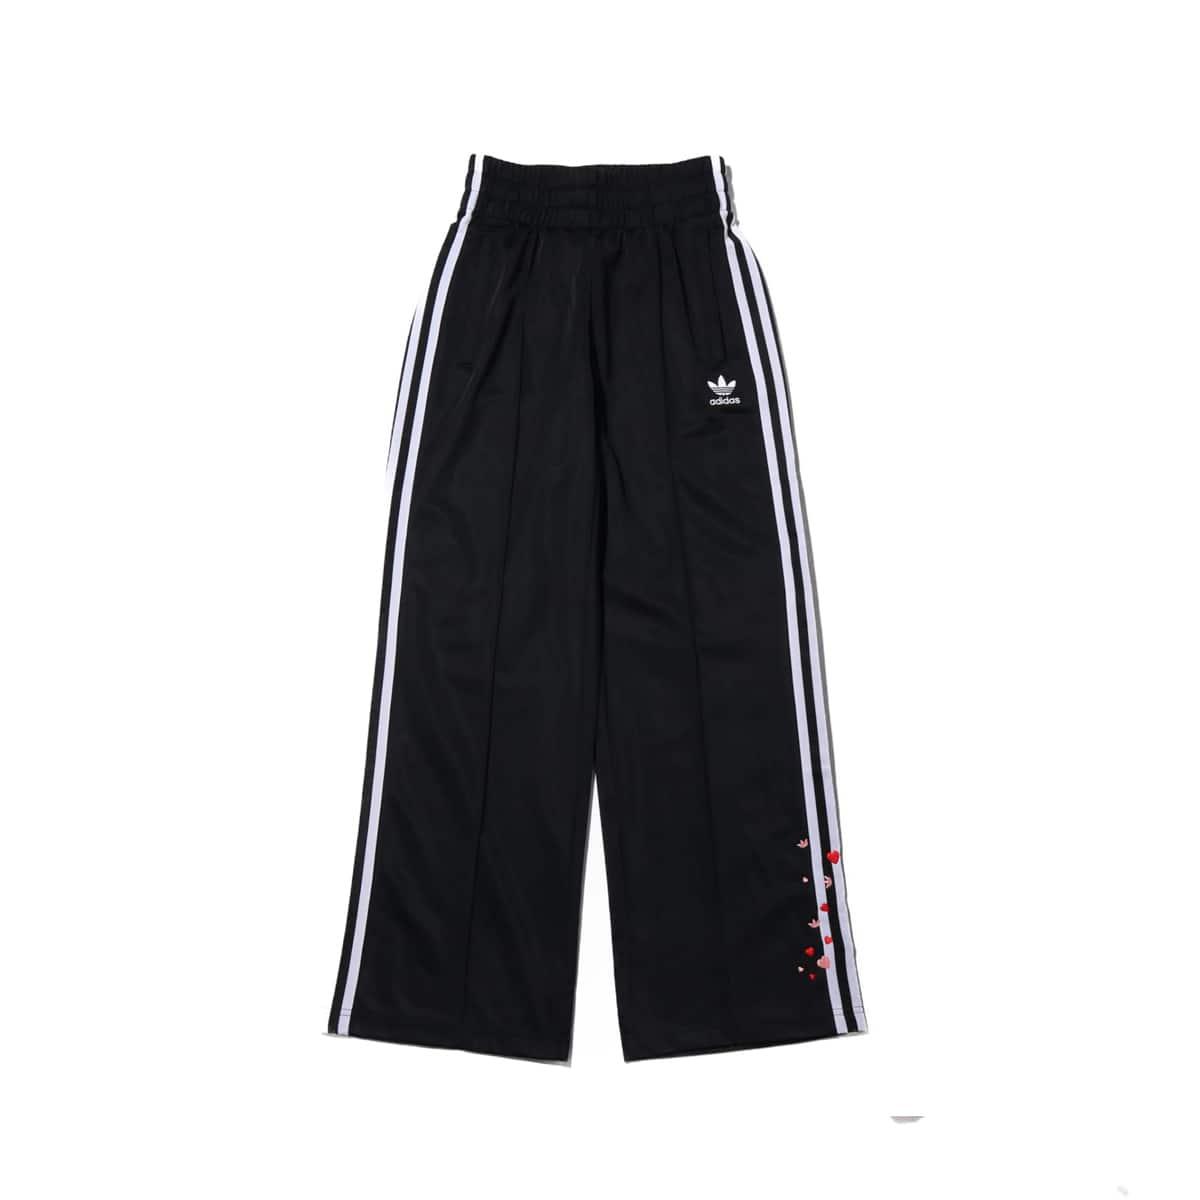 adidas TRACK PANTS BLACK 20SS-S_photo_large